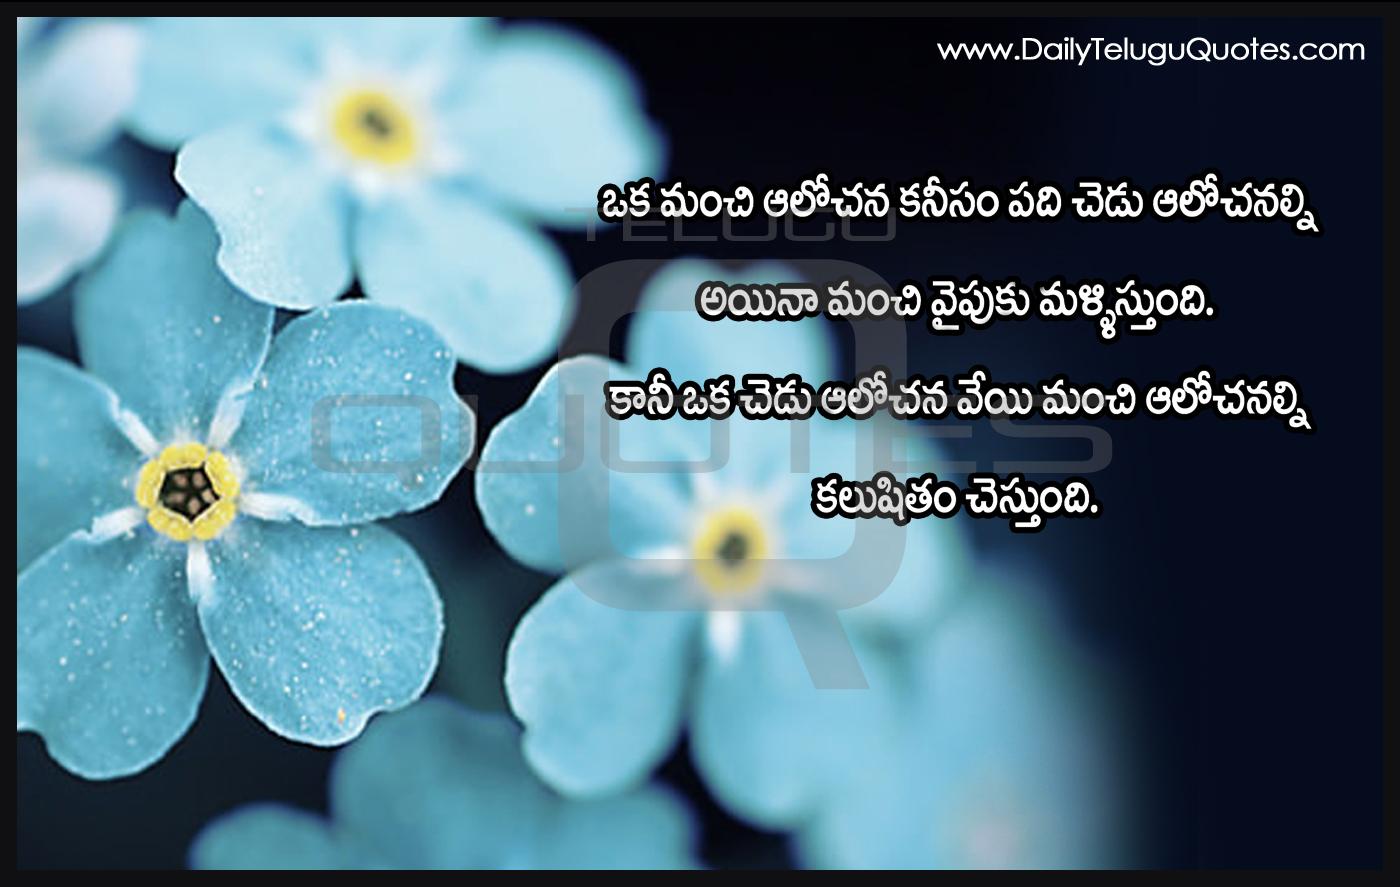 Beautiful Life Inspirational Telugu Quotes Hd Wallpapers Best Life